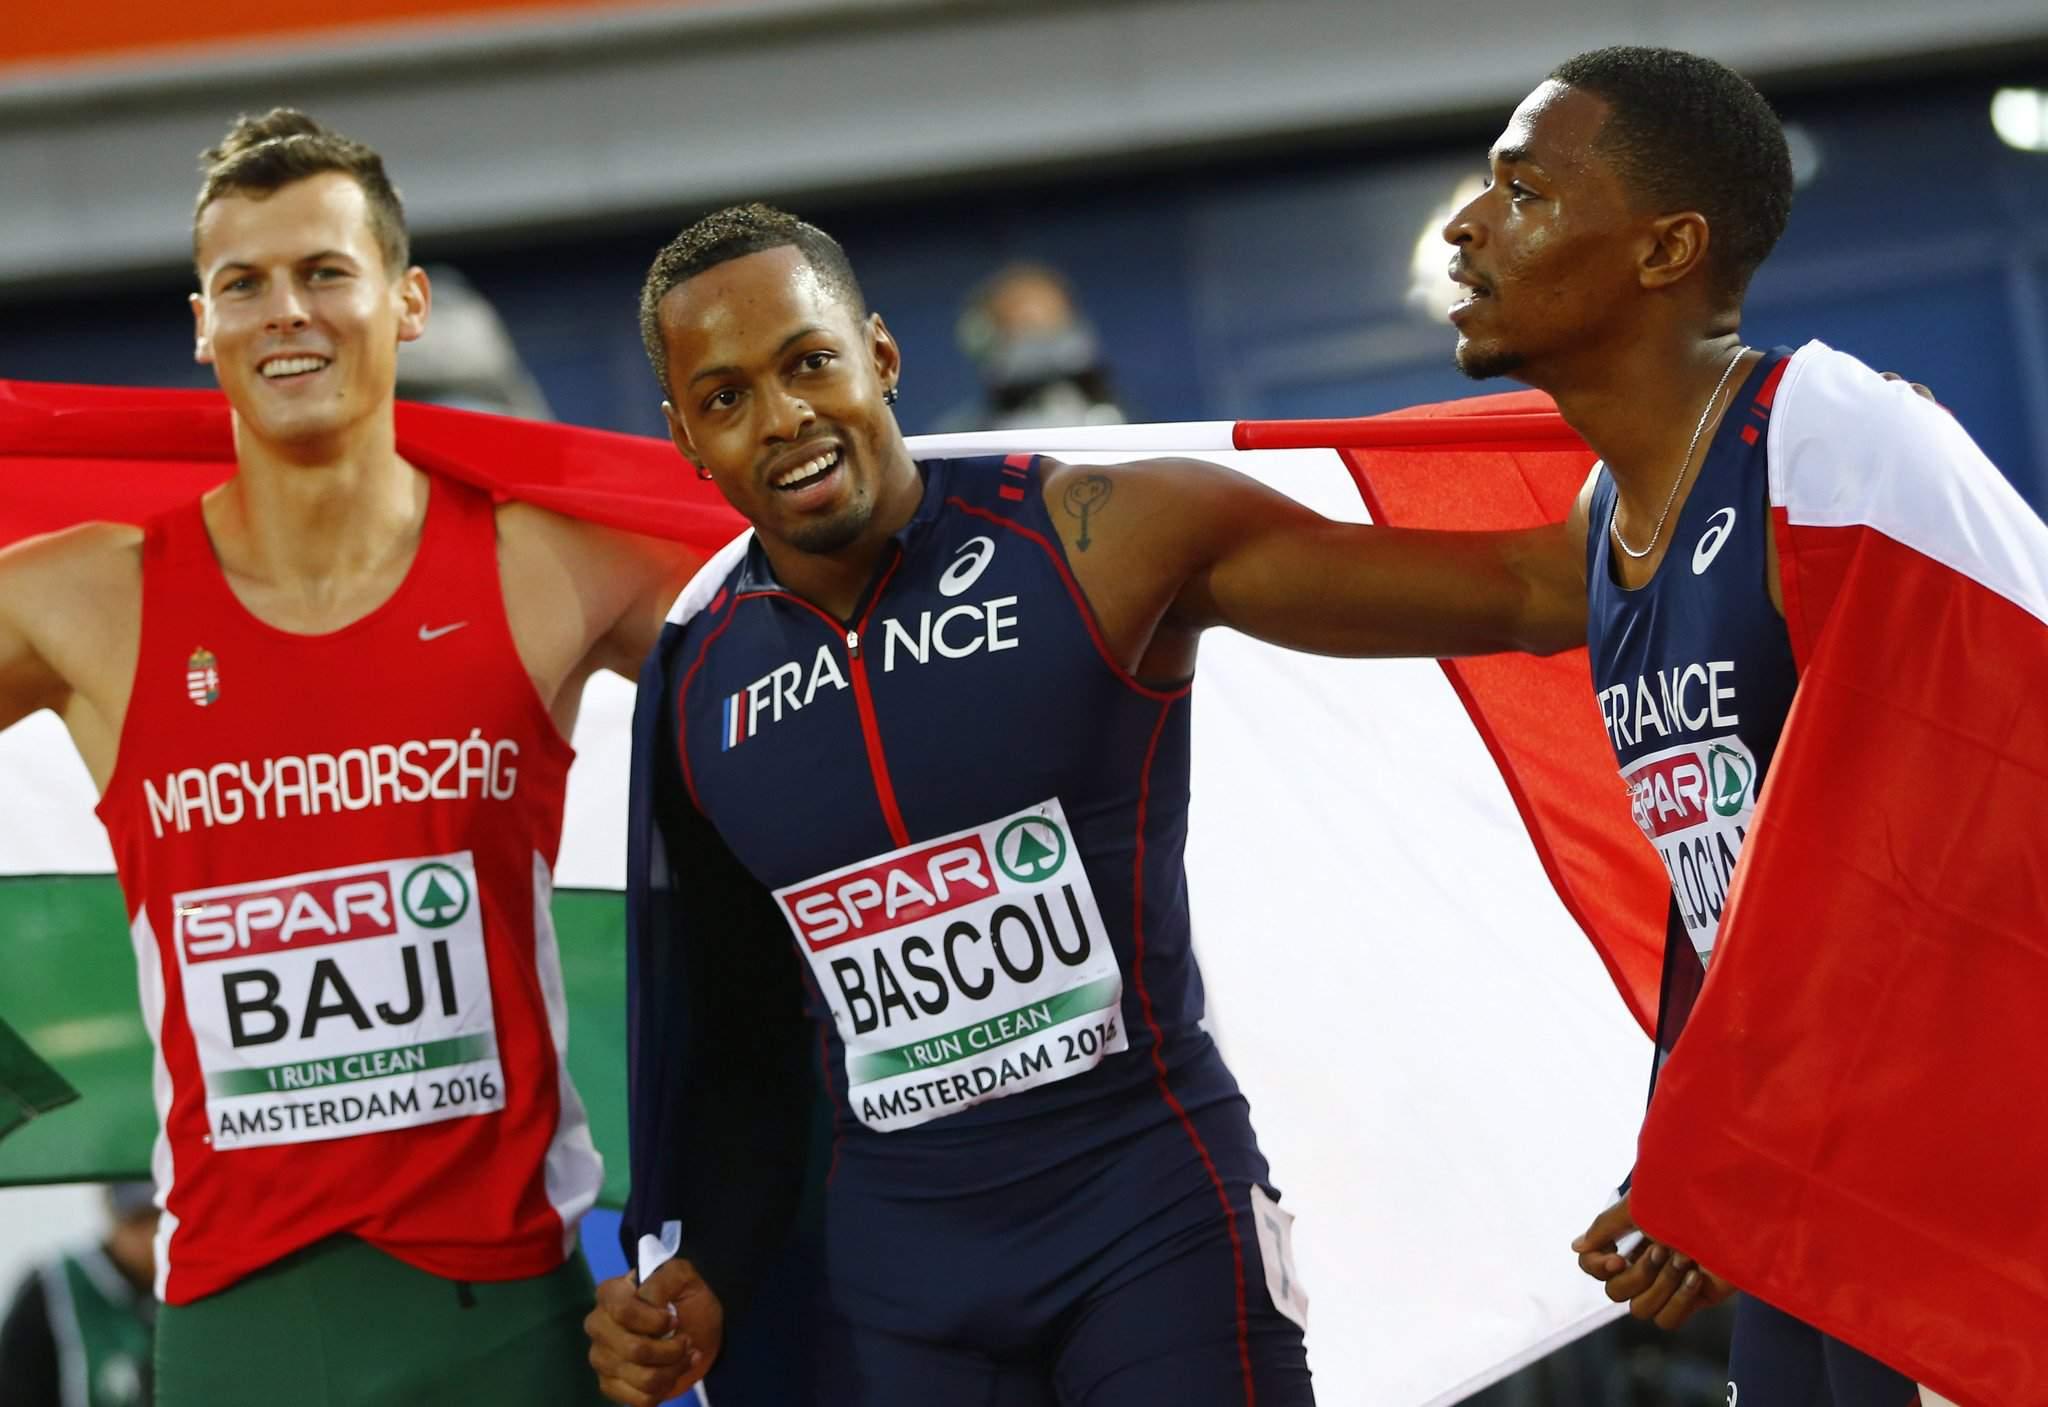 Sensation at the European Athletics Championship: Balázs Baji wins silver medal